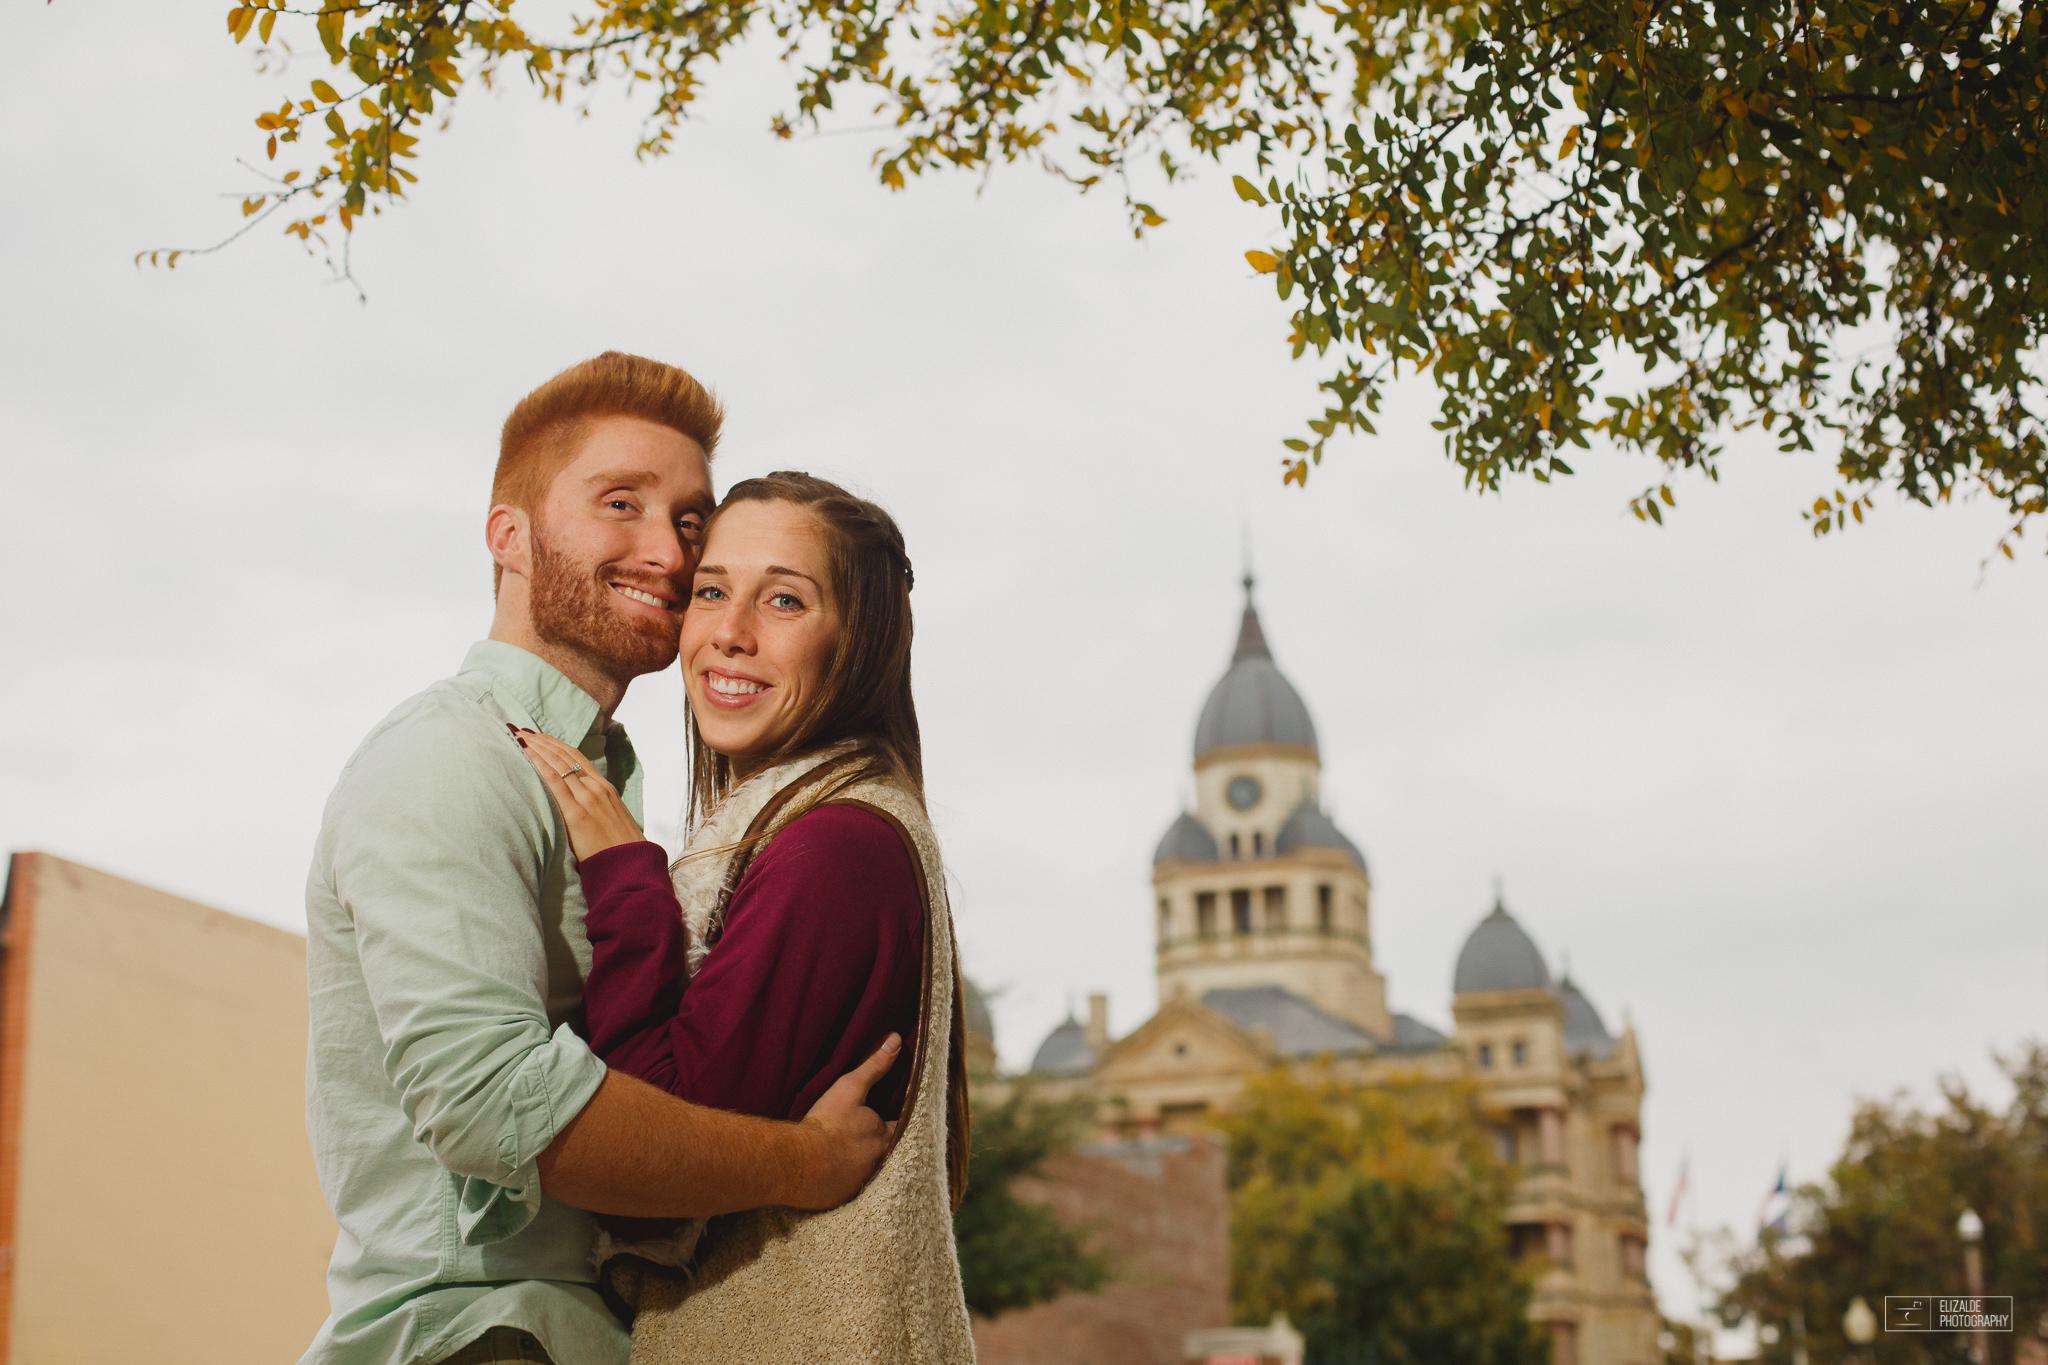 Engagement session_Engagement_Dallas photographer_Denton Photographer_elizalde photography_DFW wedding photographer_wedding (9 of 24).jpg